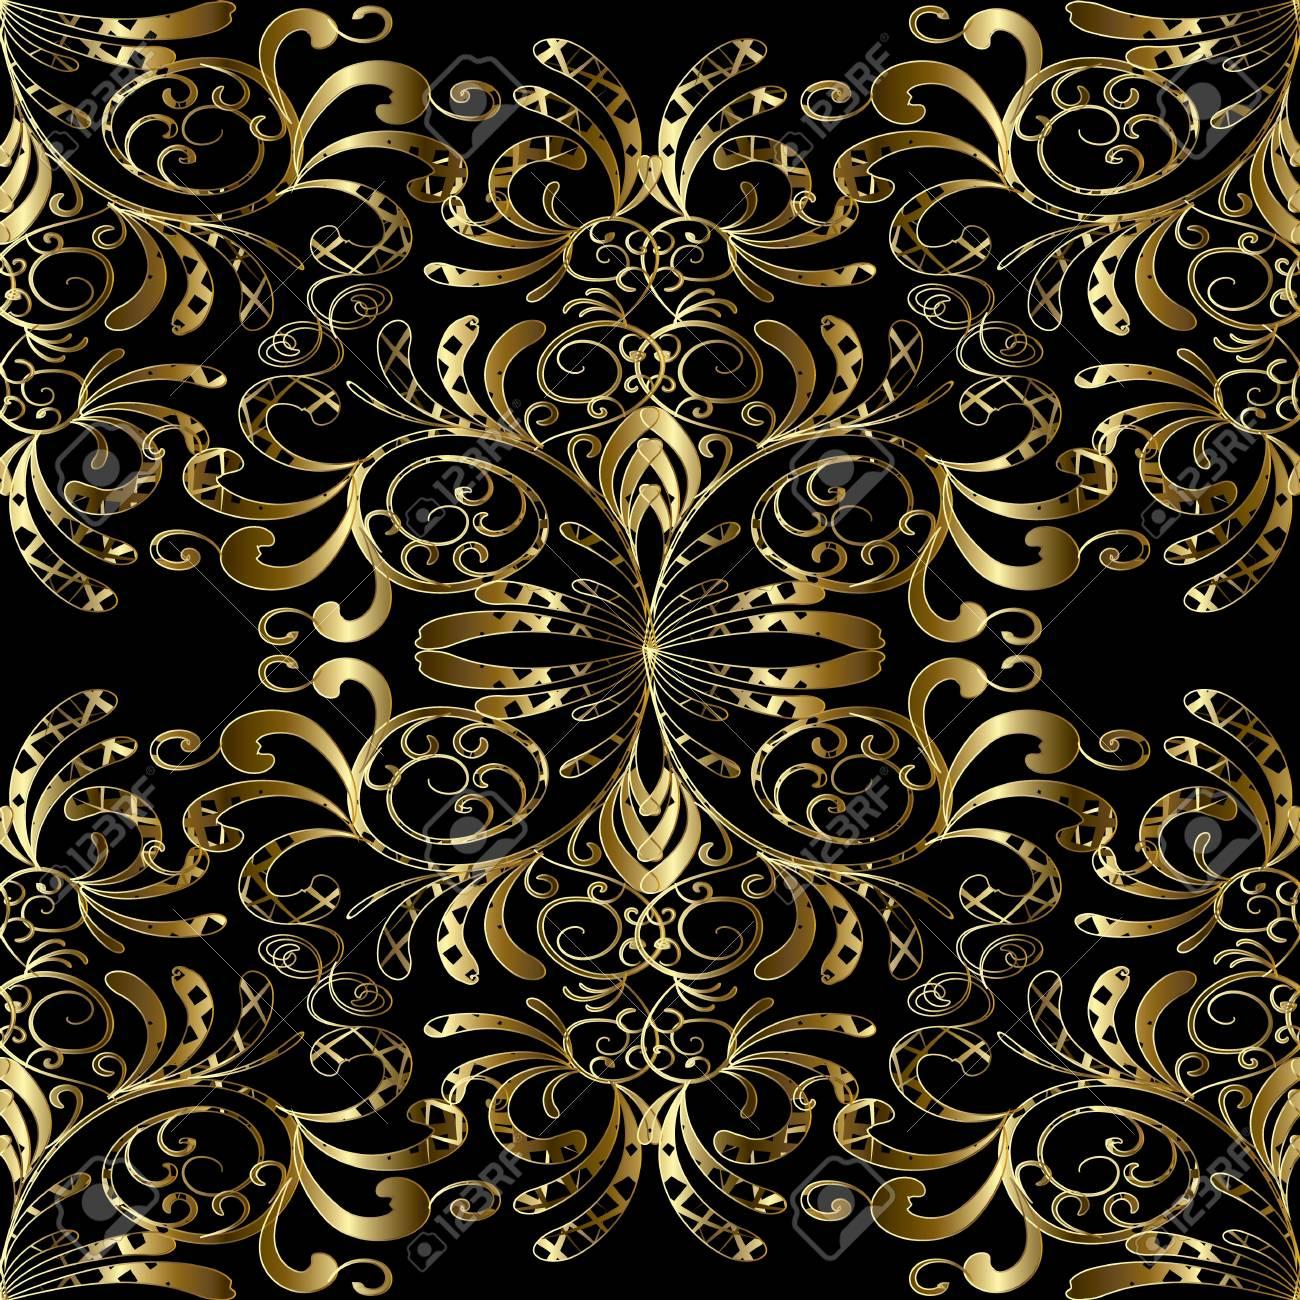 Gold Floral Paisleys Seamless Pattern Damask Vintage Gold Black